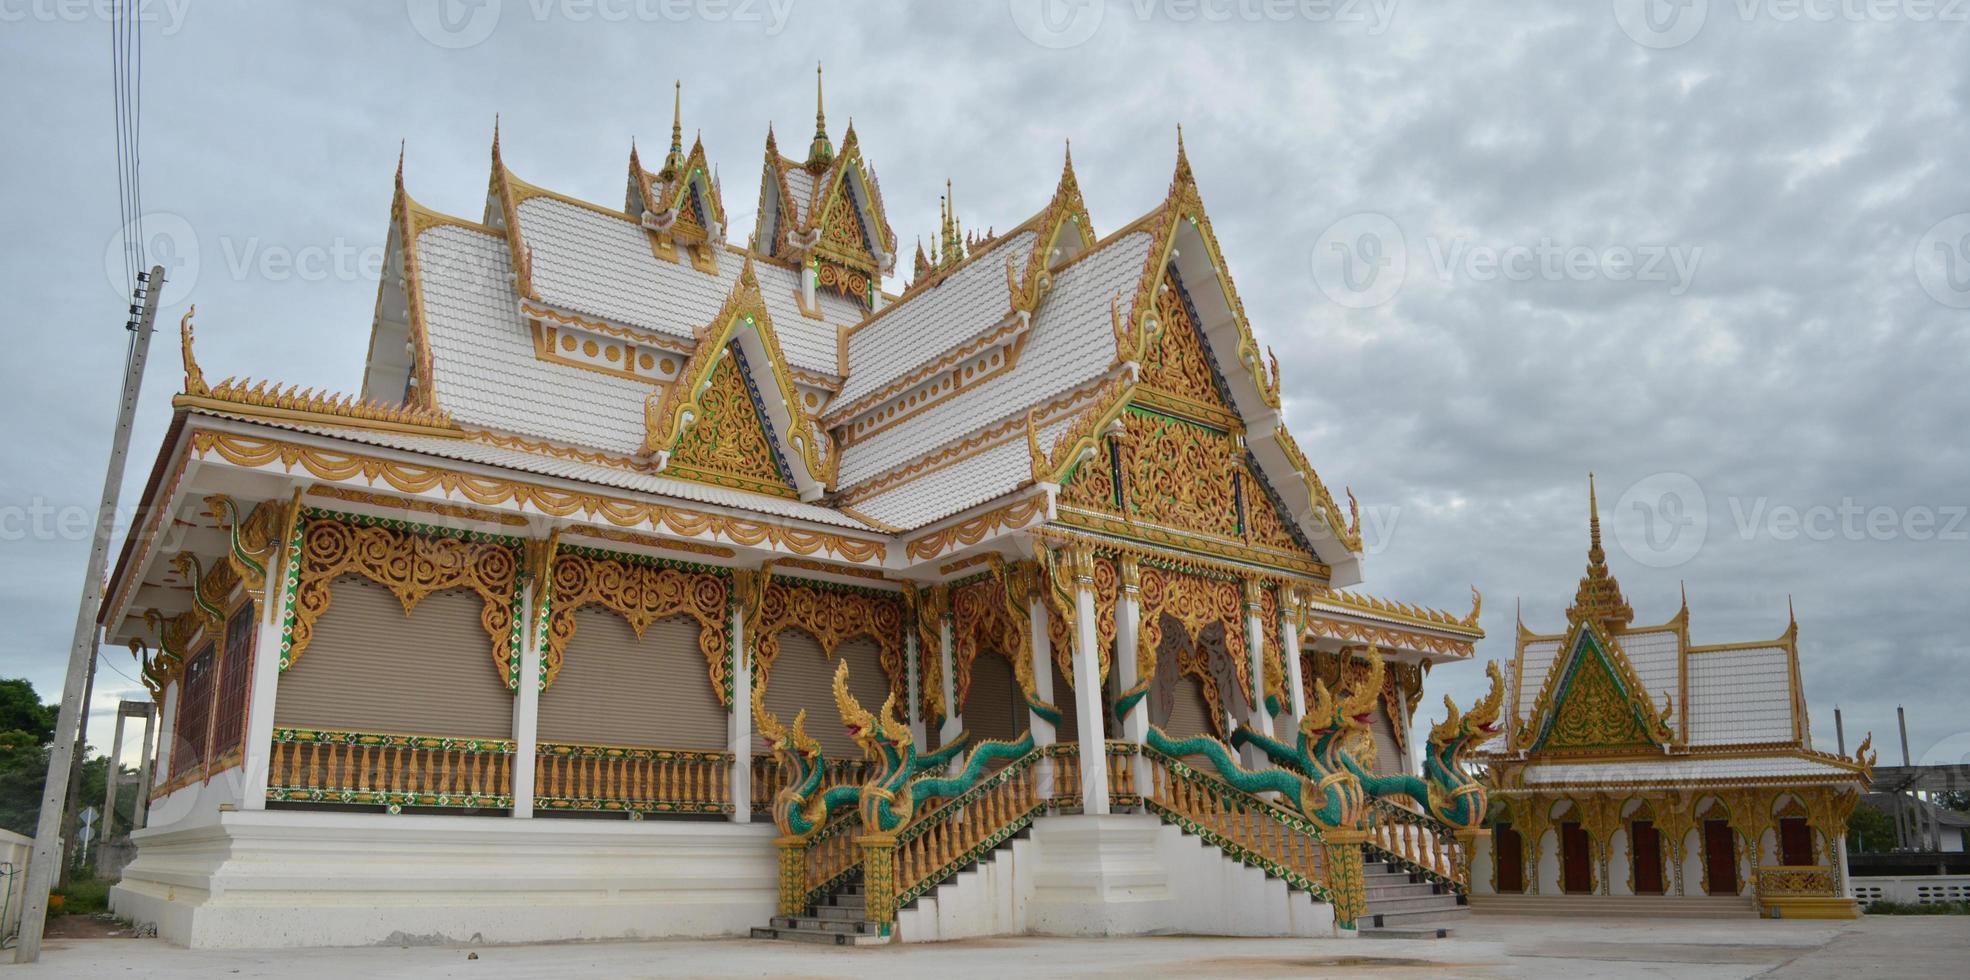 grote gouden tempel thailand foto